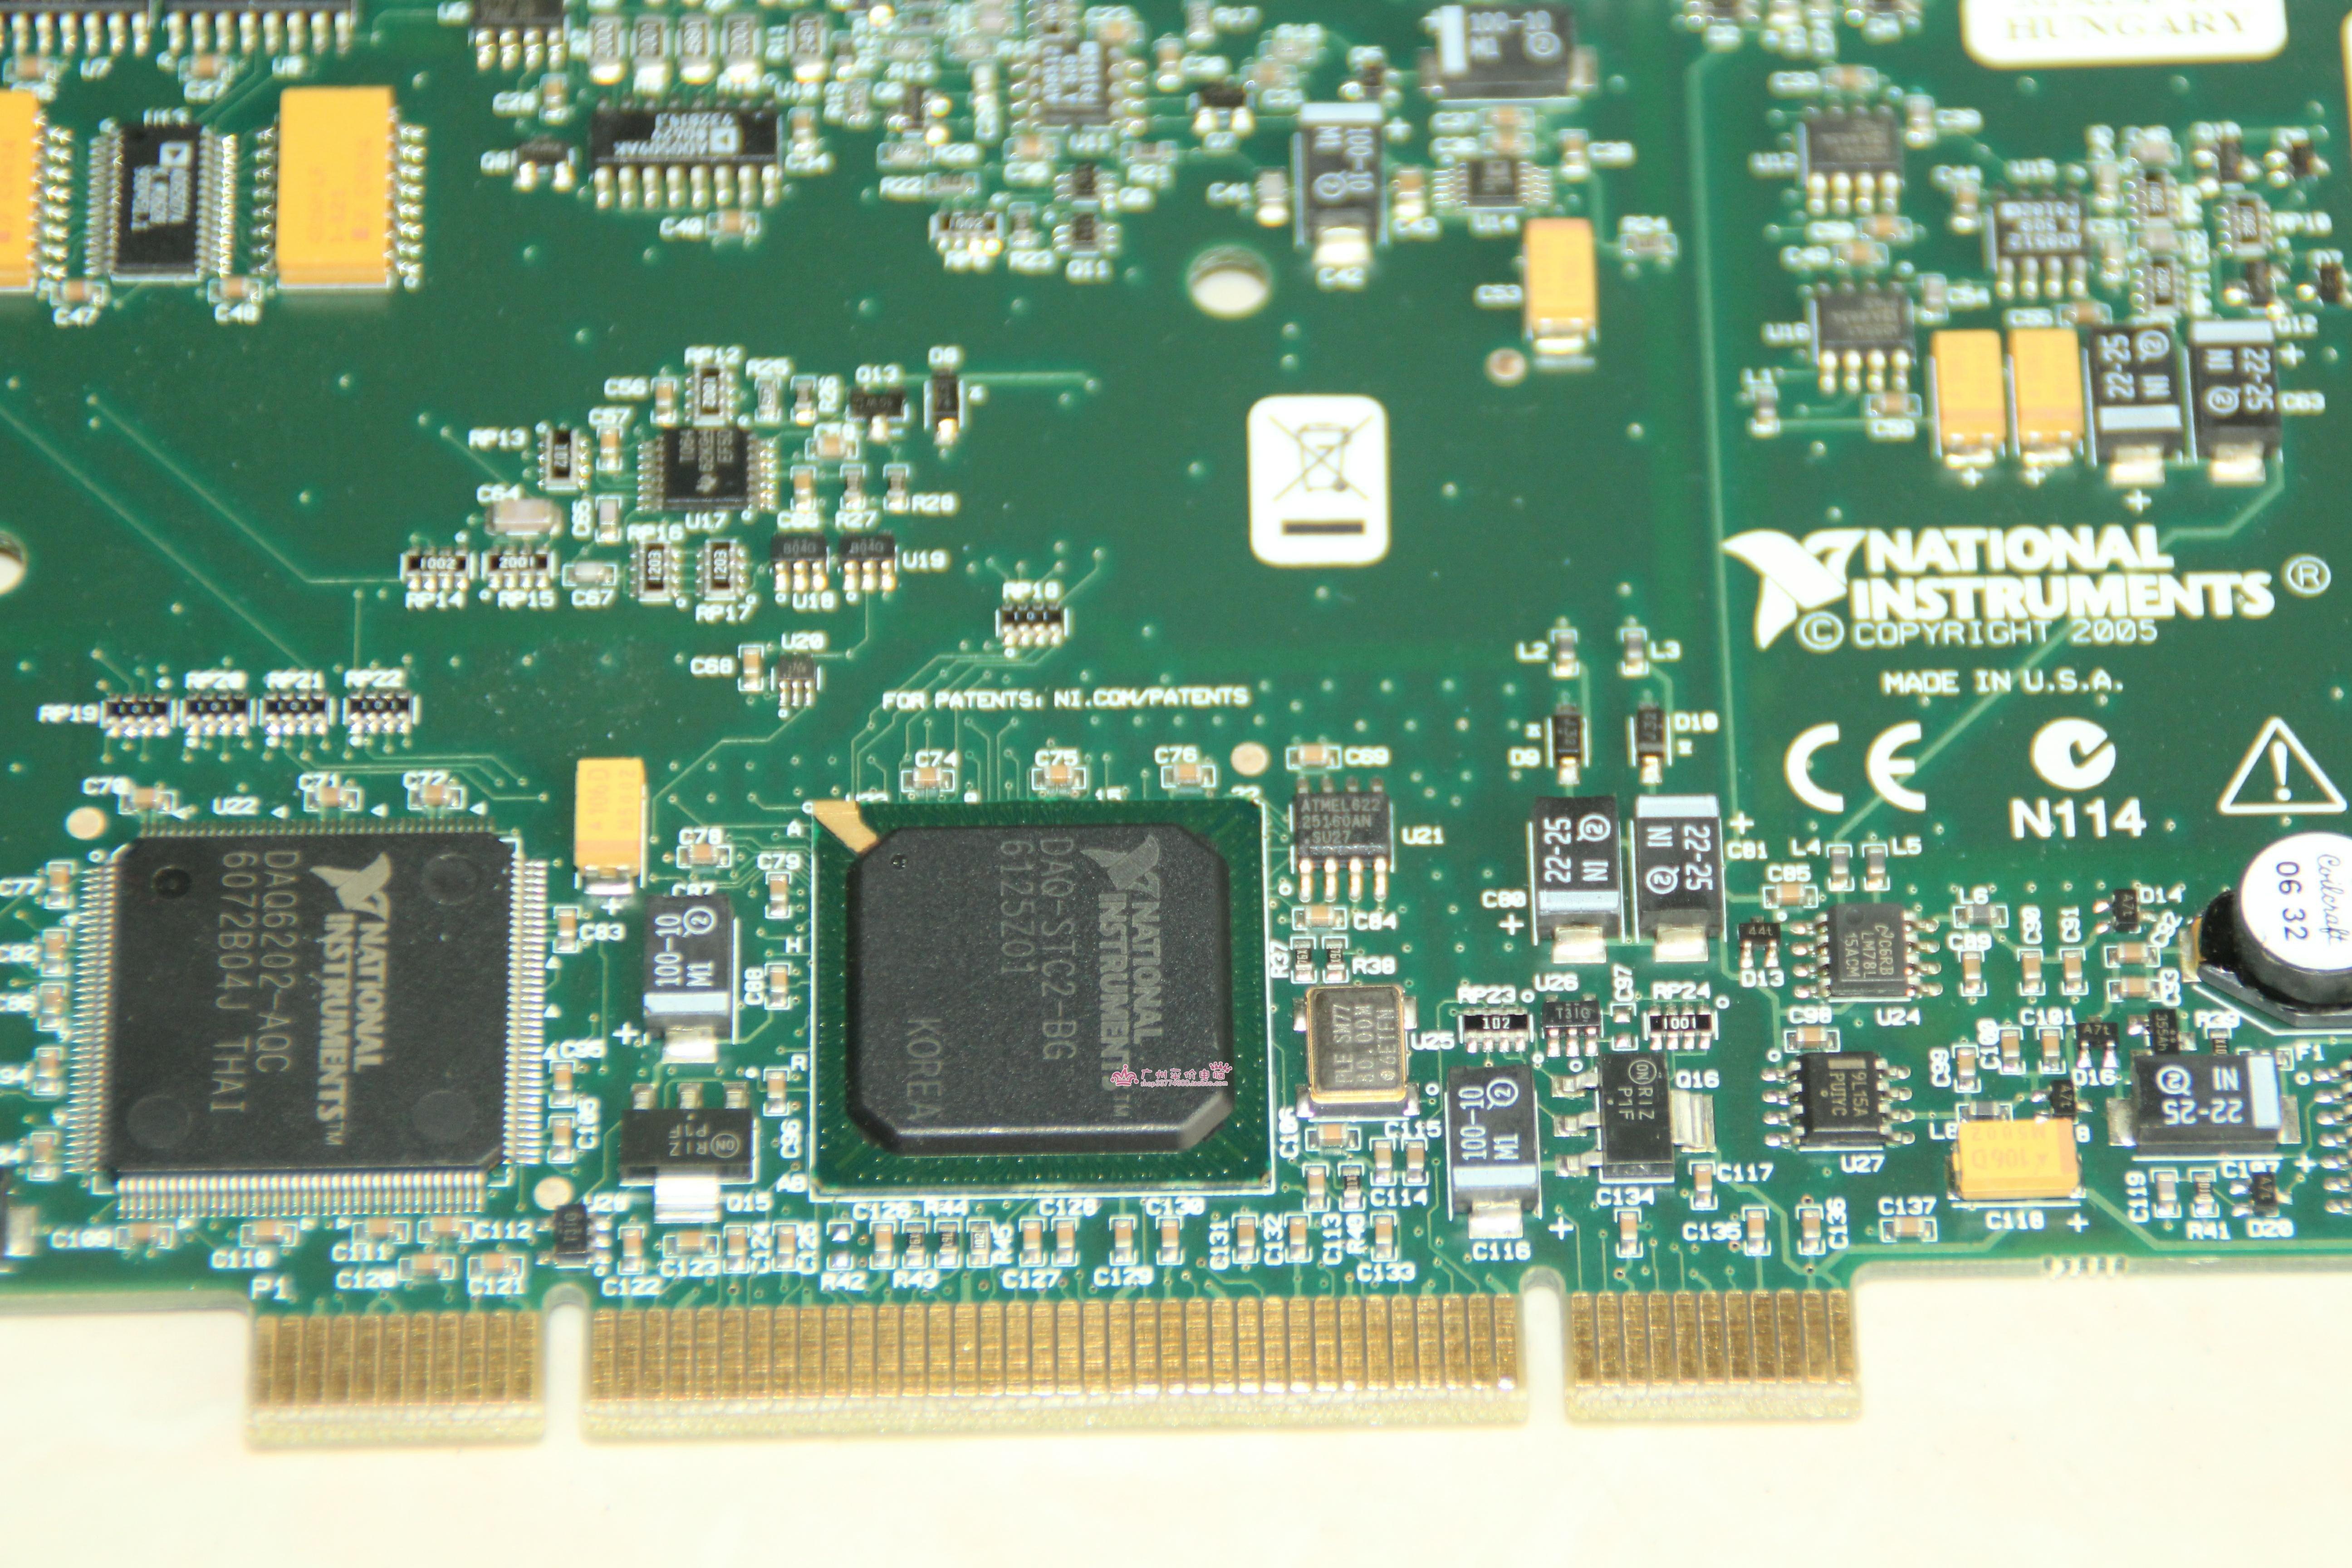 NI PCI-6221 37pin Multi-function Data Acquisition Card